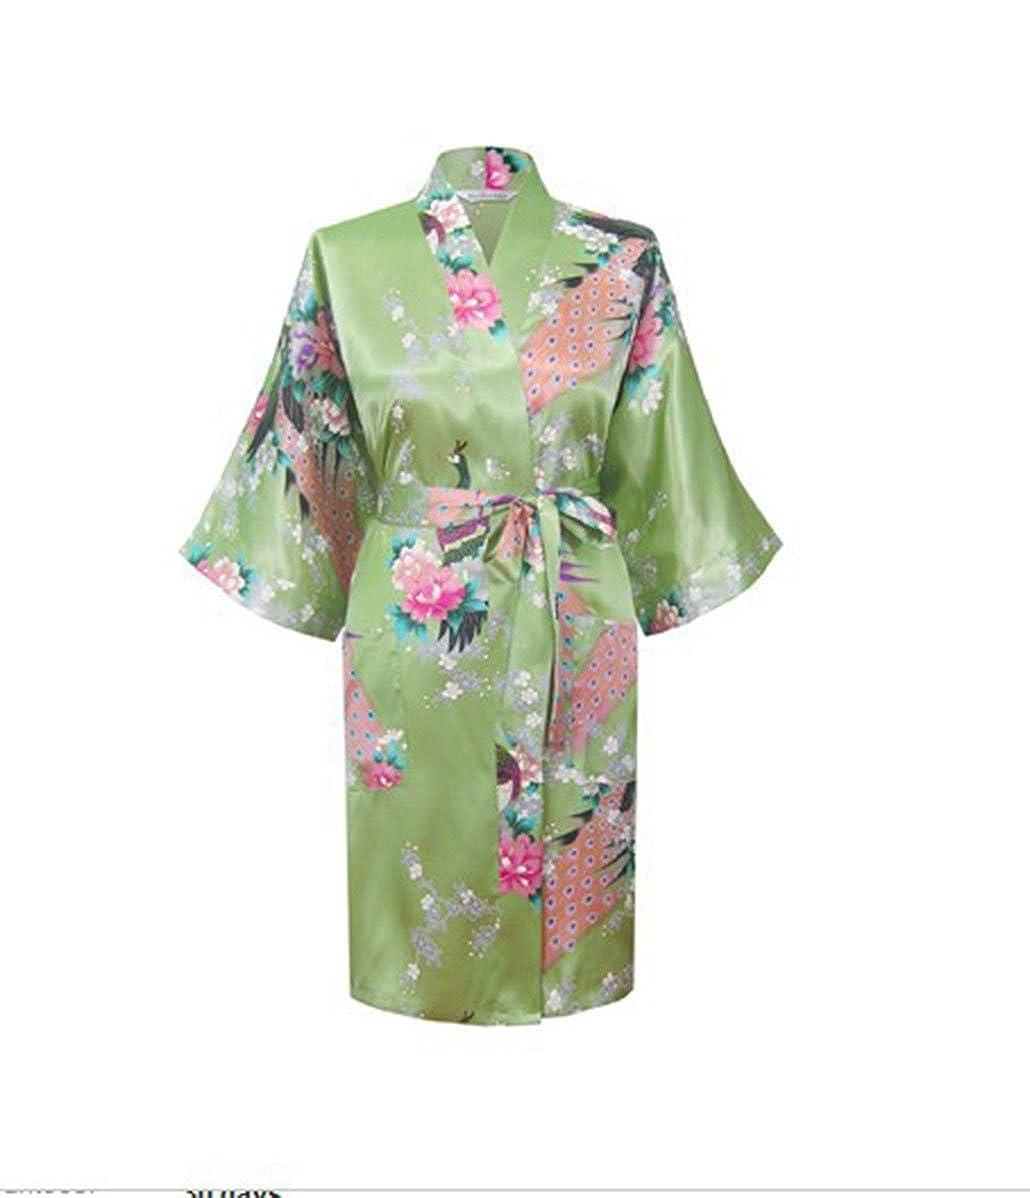 Silk Satin Wedding Bride Bridesmaid Robe Floral Bathrobe Short Kimono Robe  Night Robe Bath at Amazon Women s Clothing store  1ad316ae0